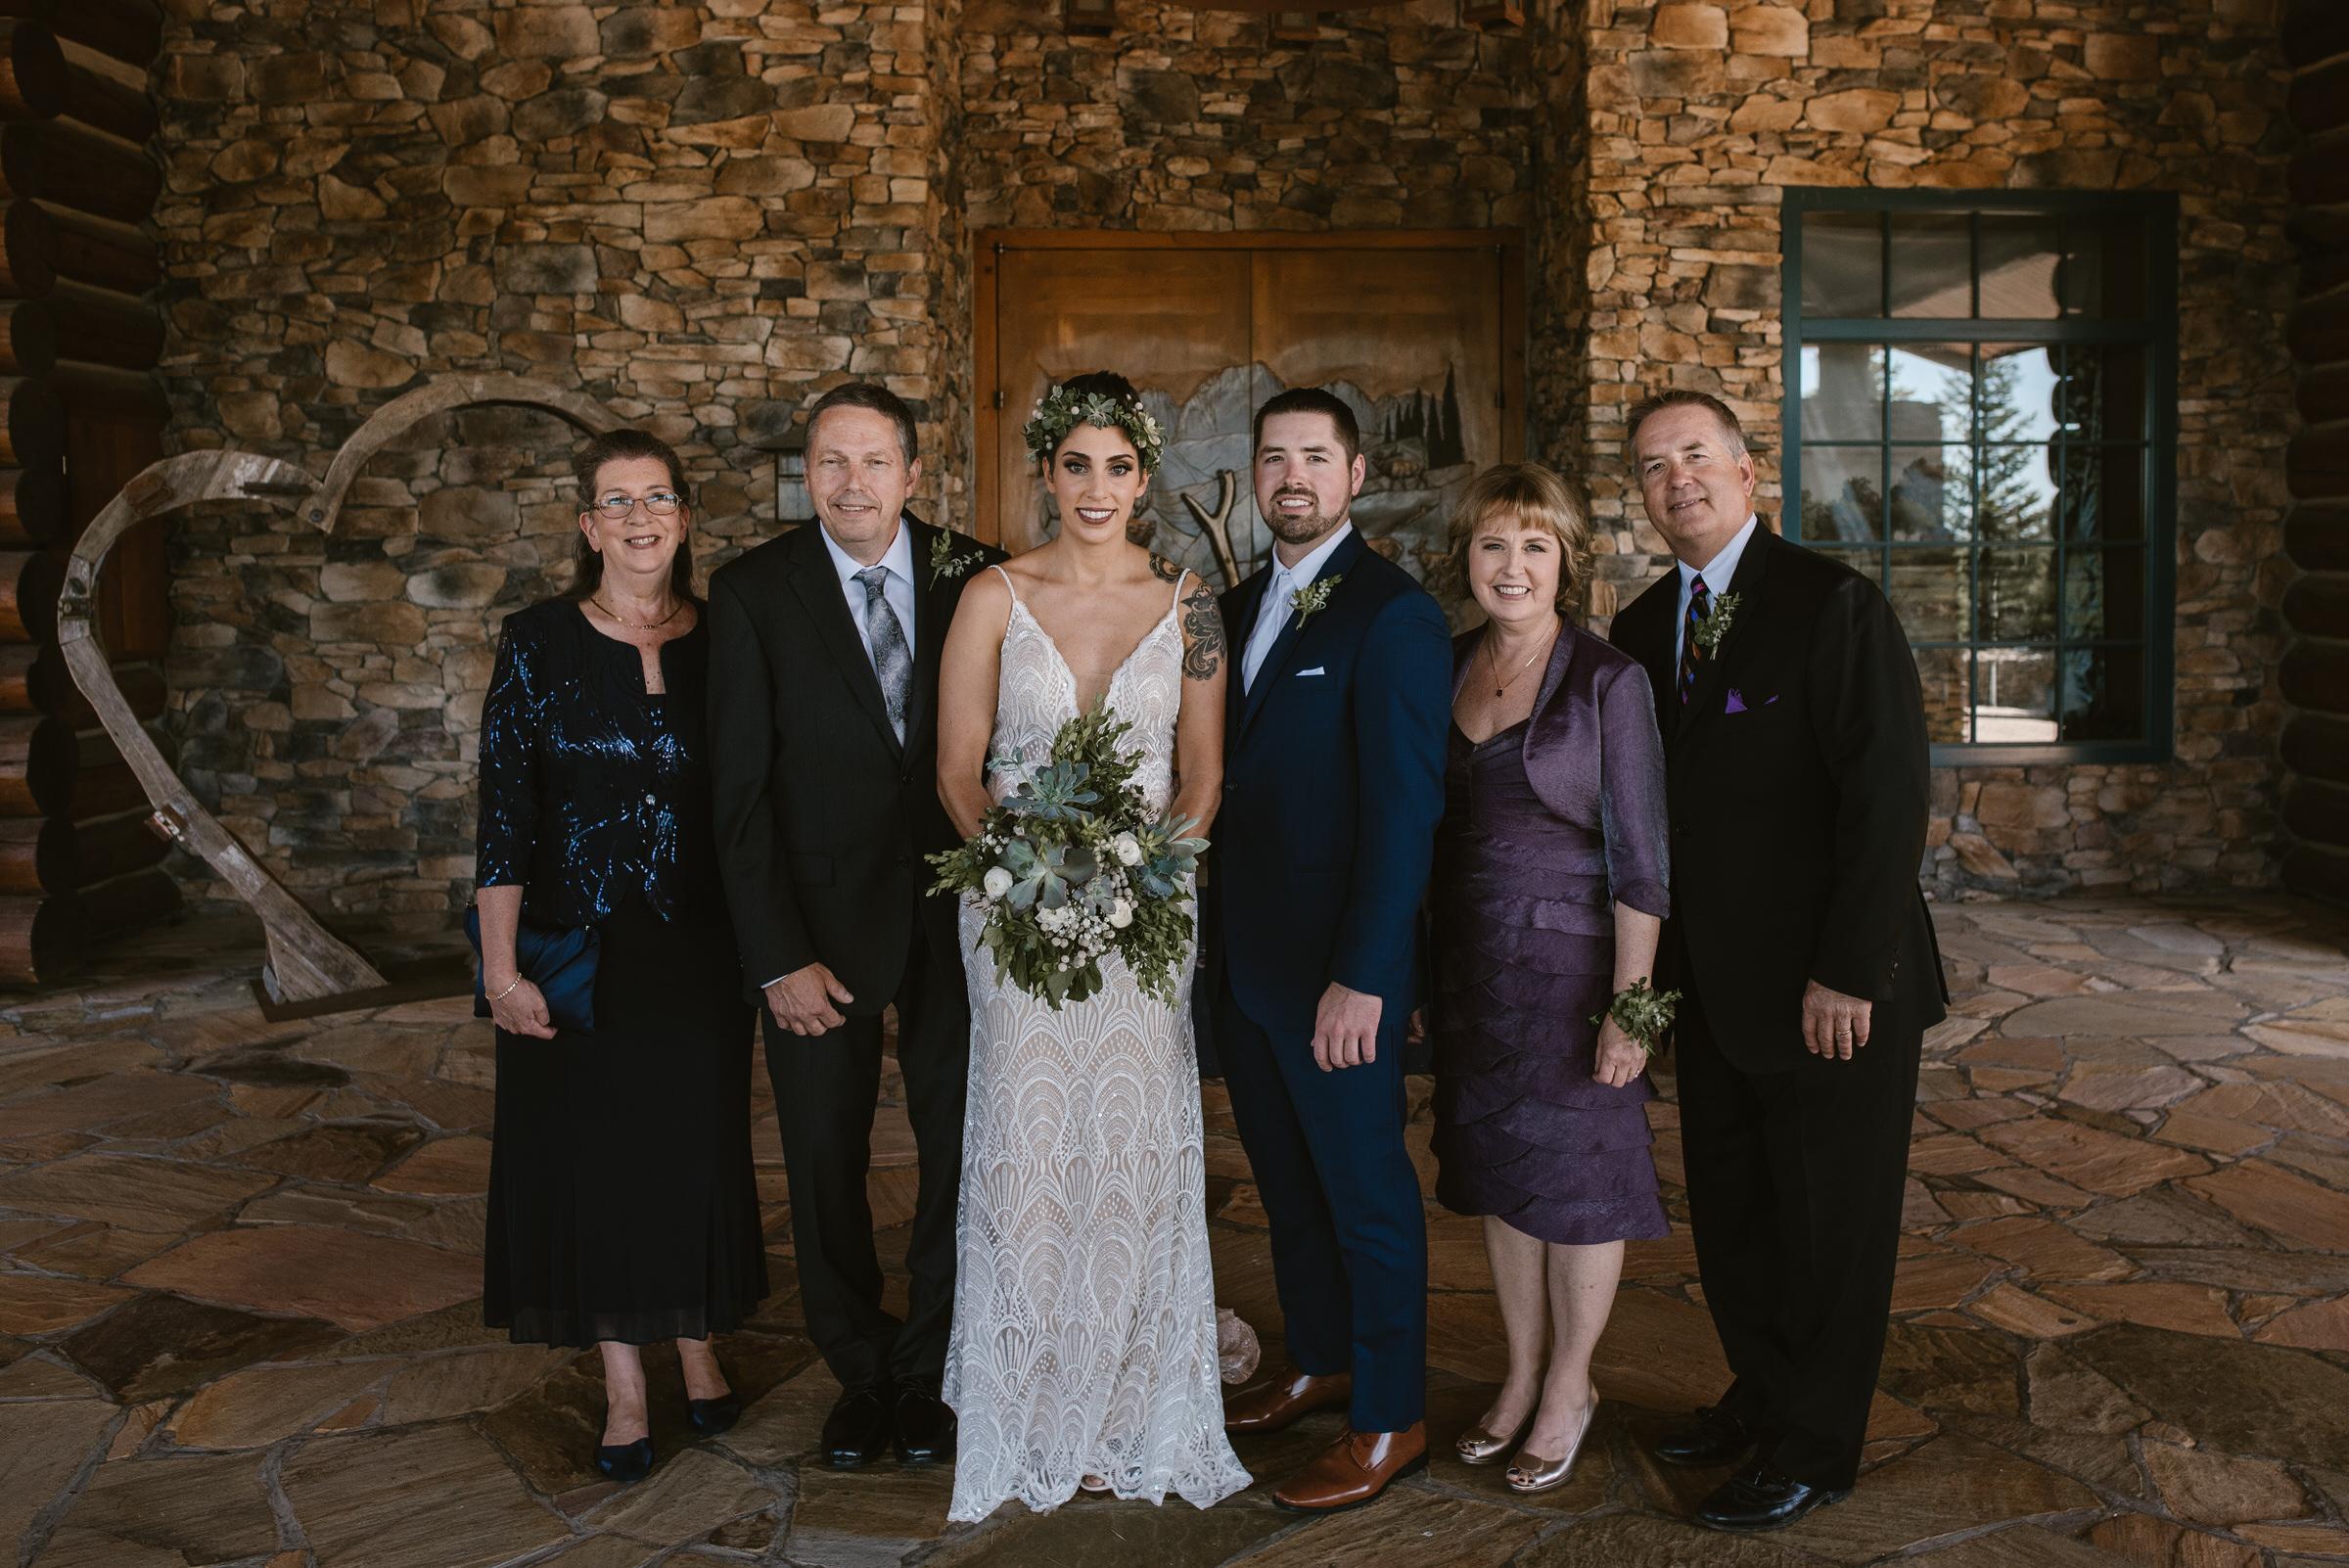 Wilderness-Ridge-Lincoln-Nebraska-Wedding-Kaylie-Sirek-Photography-038.jpg